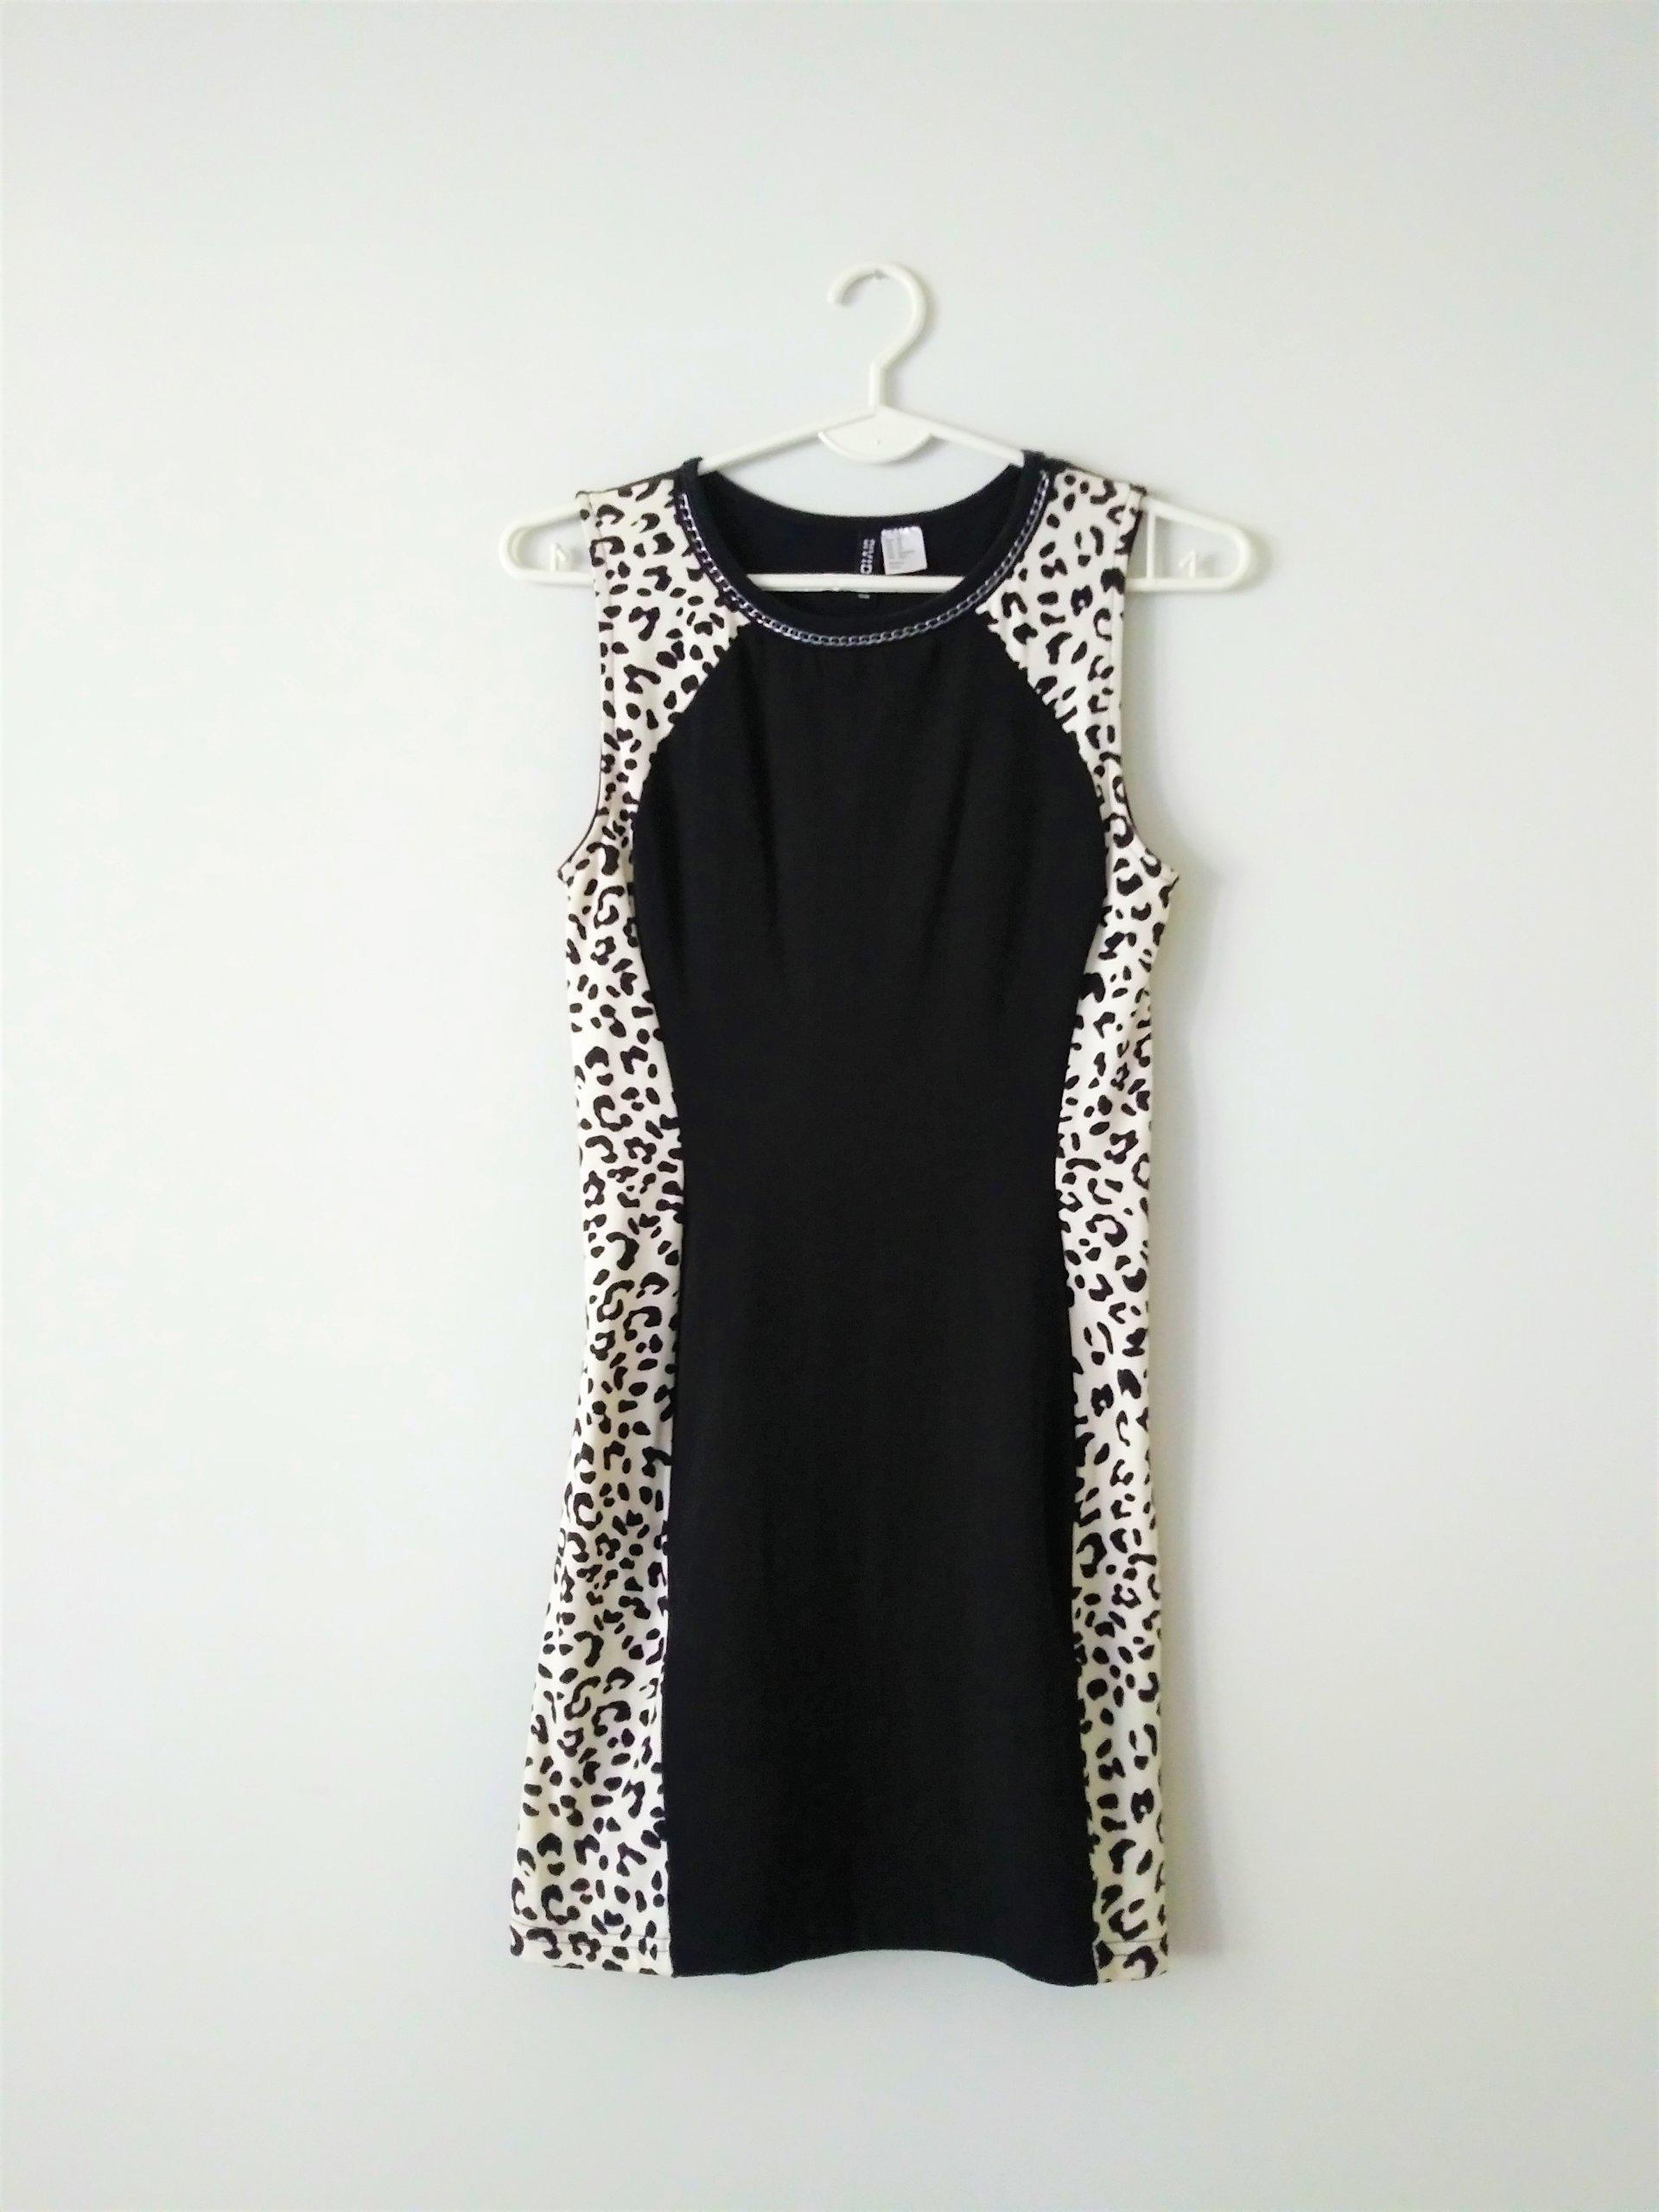 Sukienka H&M czarno biała XS studniówka 7682616324